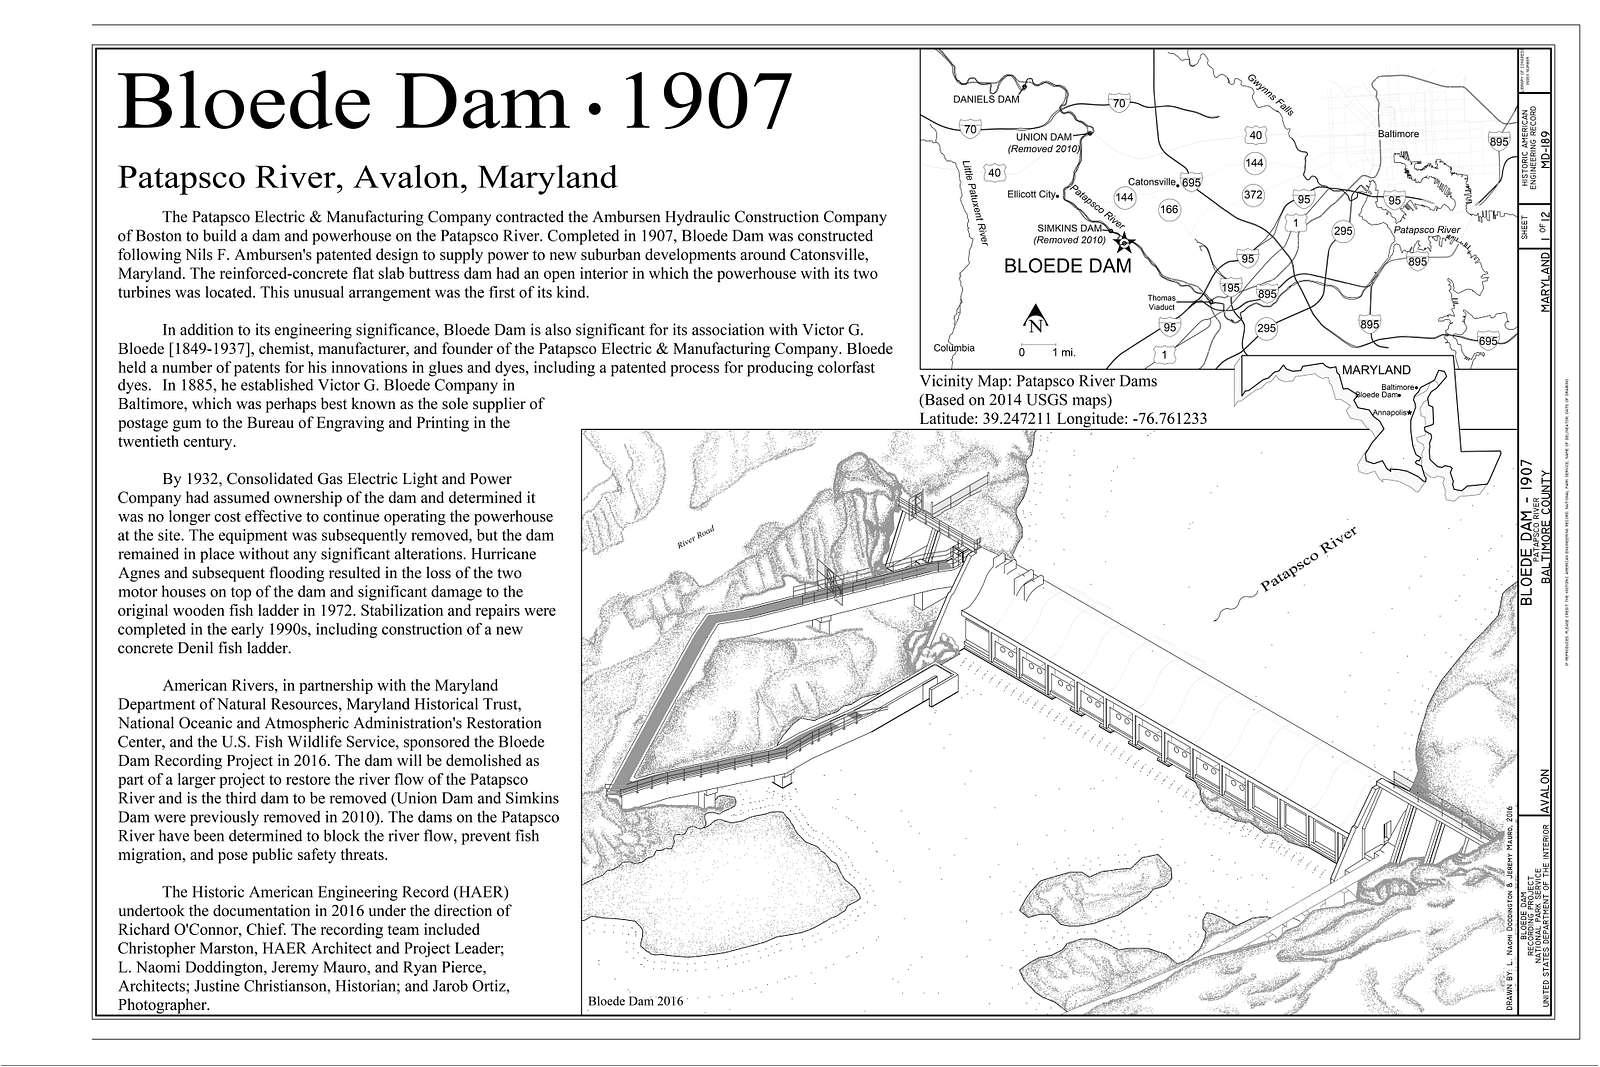 Bloede Dam, Spanning Patapsco River, Avalon, Baltimore County, MD